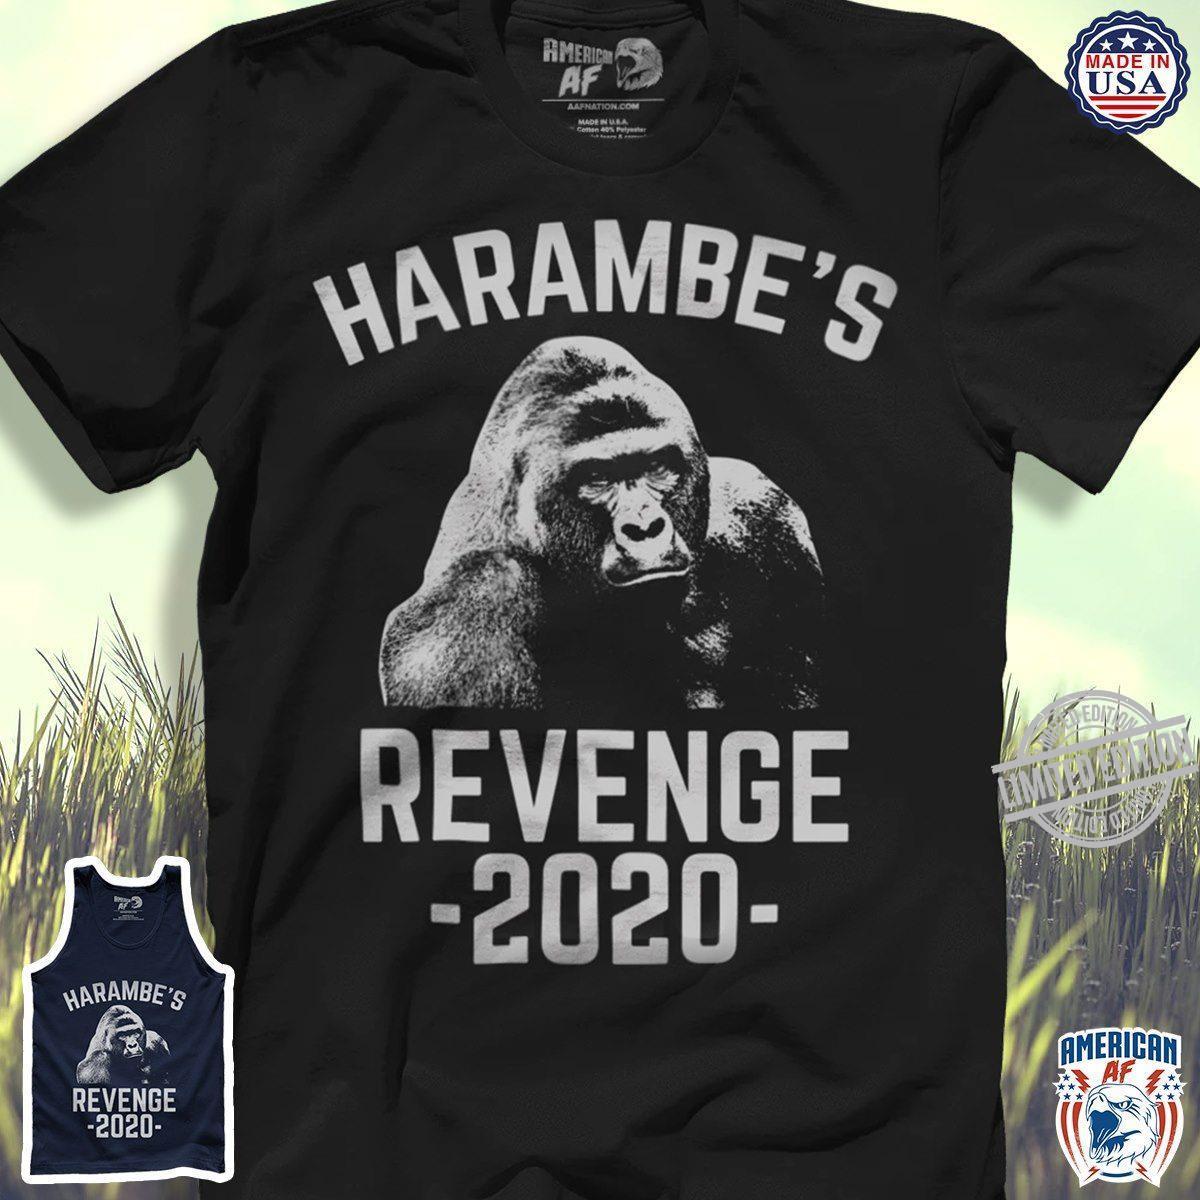 King Harambe's Revenge 2020 Shirt